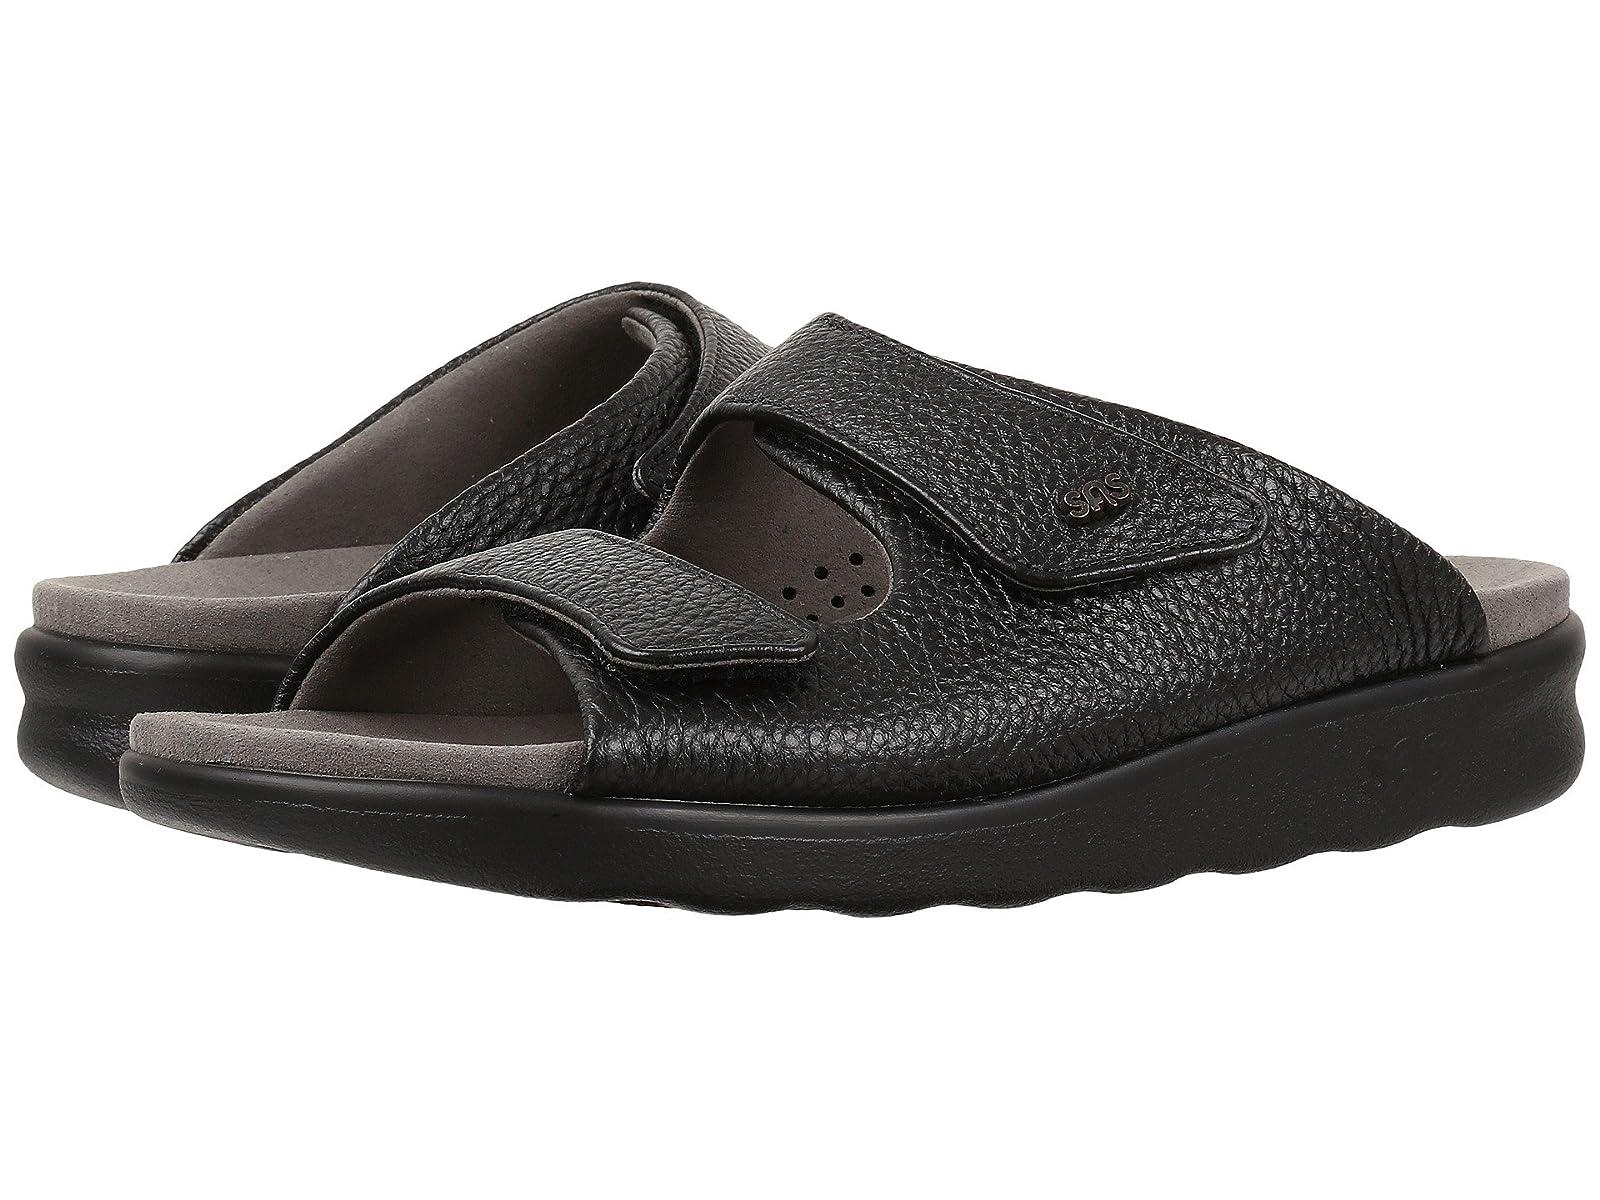 SAS CozyAtmospheric grades have affordable shoes